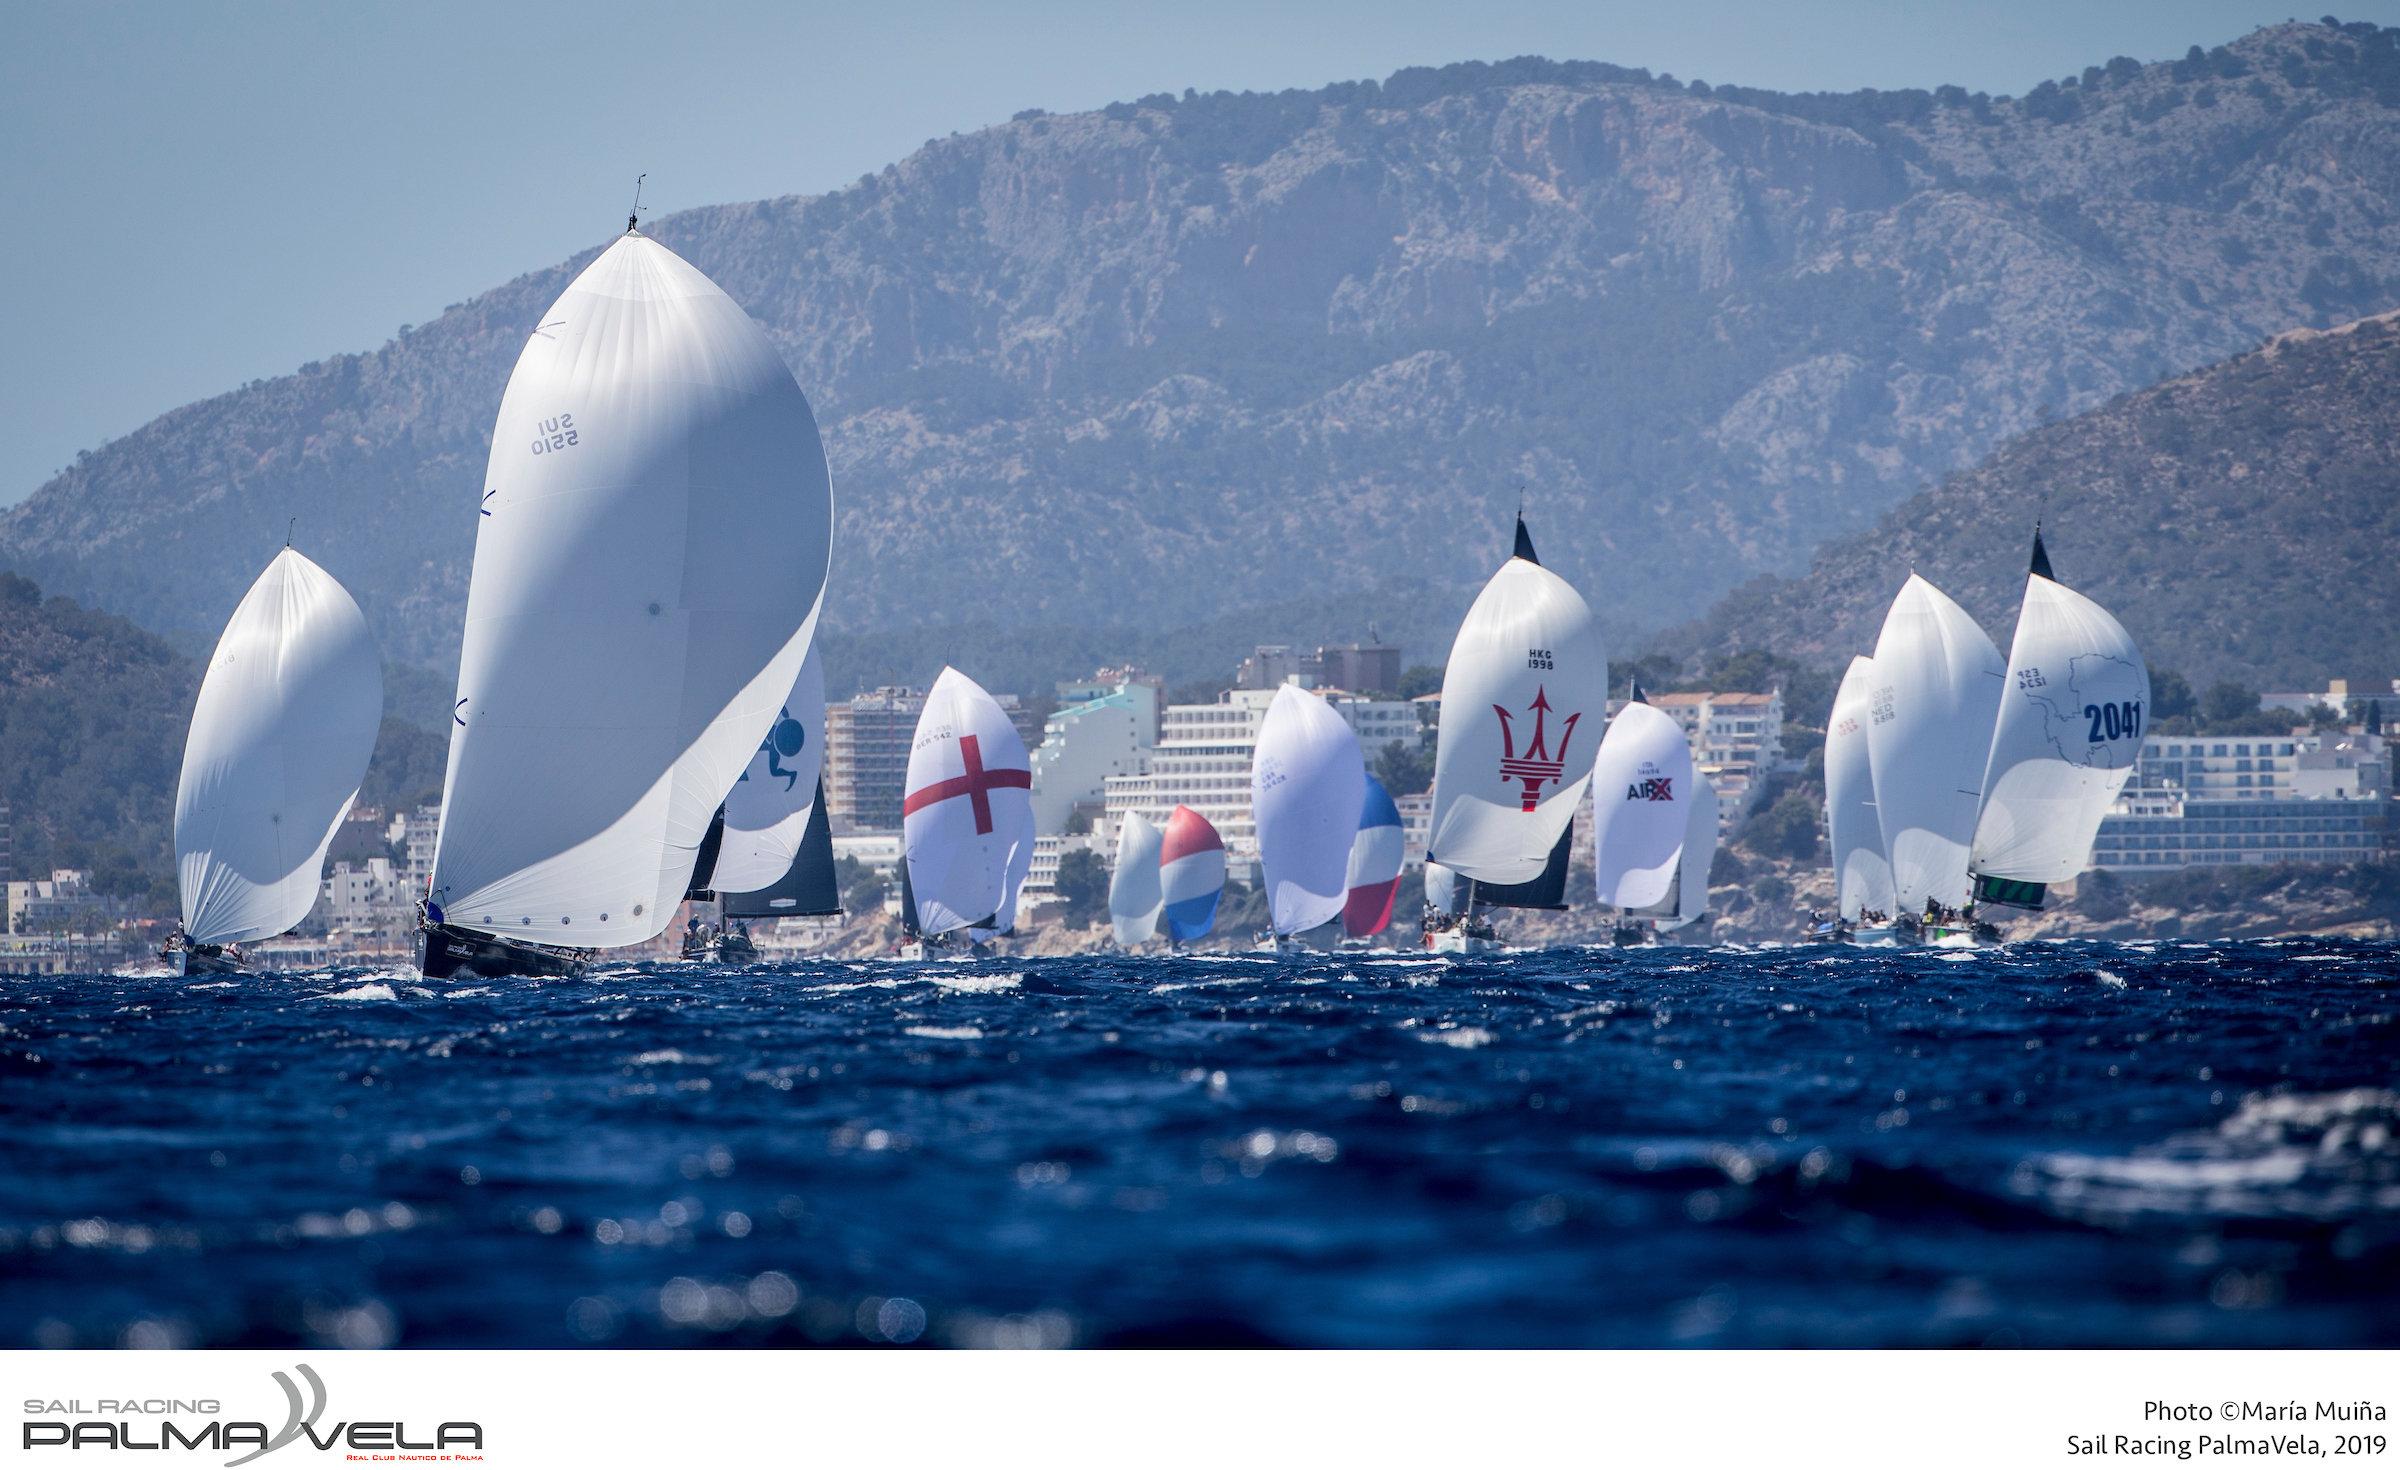 Mallorca Sotheby´s ORC 1 fleet sailing today on the Bay of Palma. Photo Maria Muina.